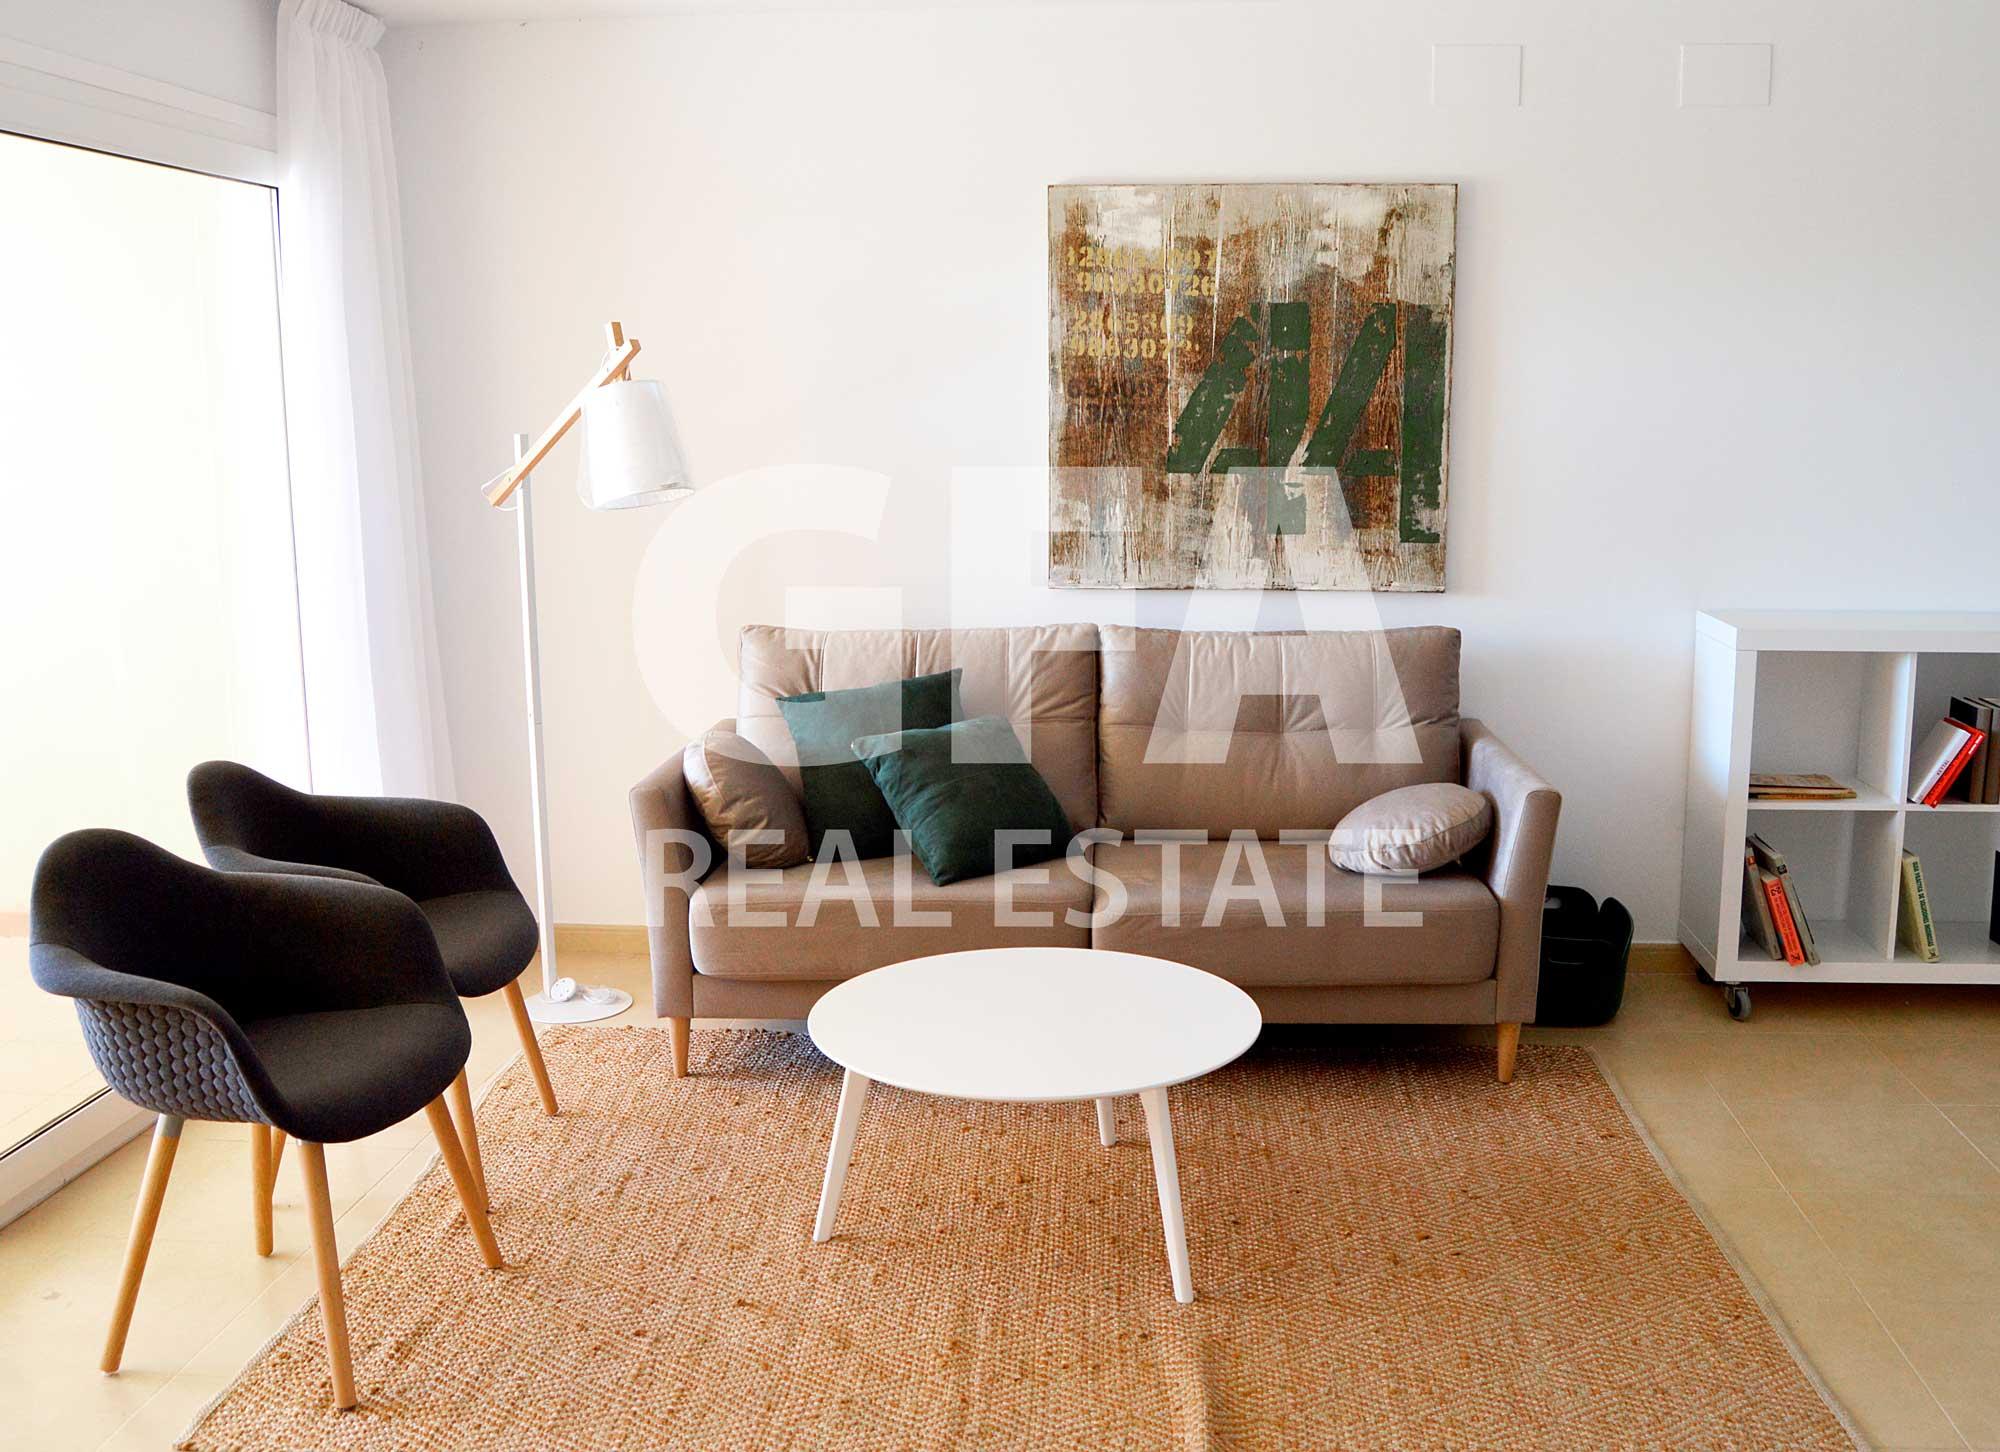 boulevard-viviendas-de-obra-nueva-resort-mar-menor (31)